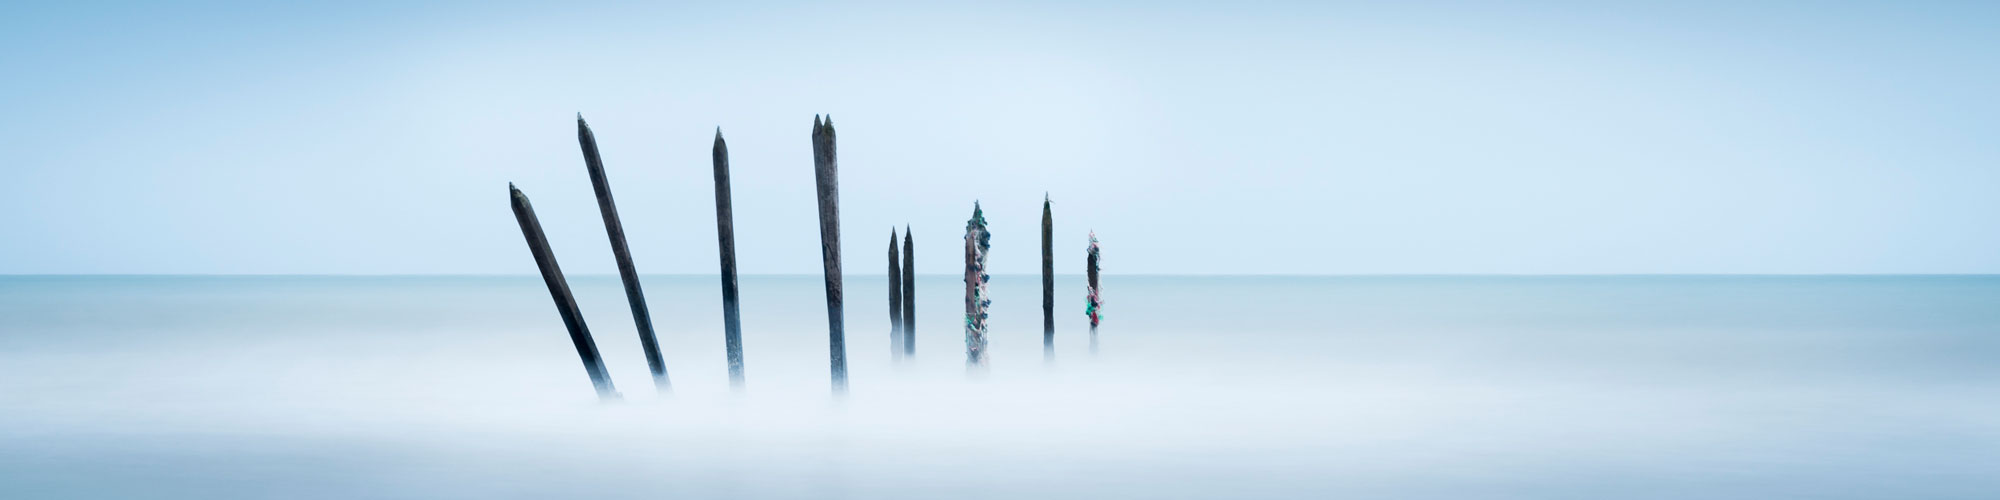 ©Wilco Dragt - Opaalkust